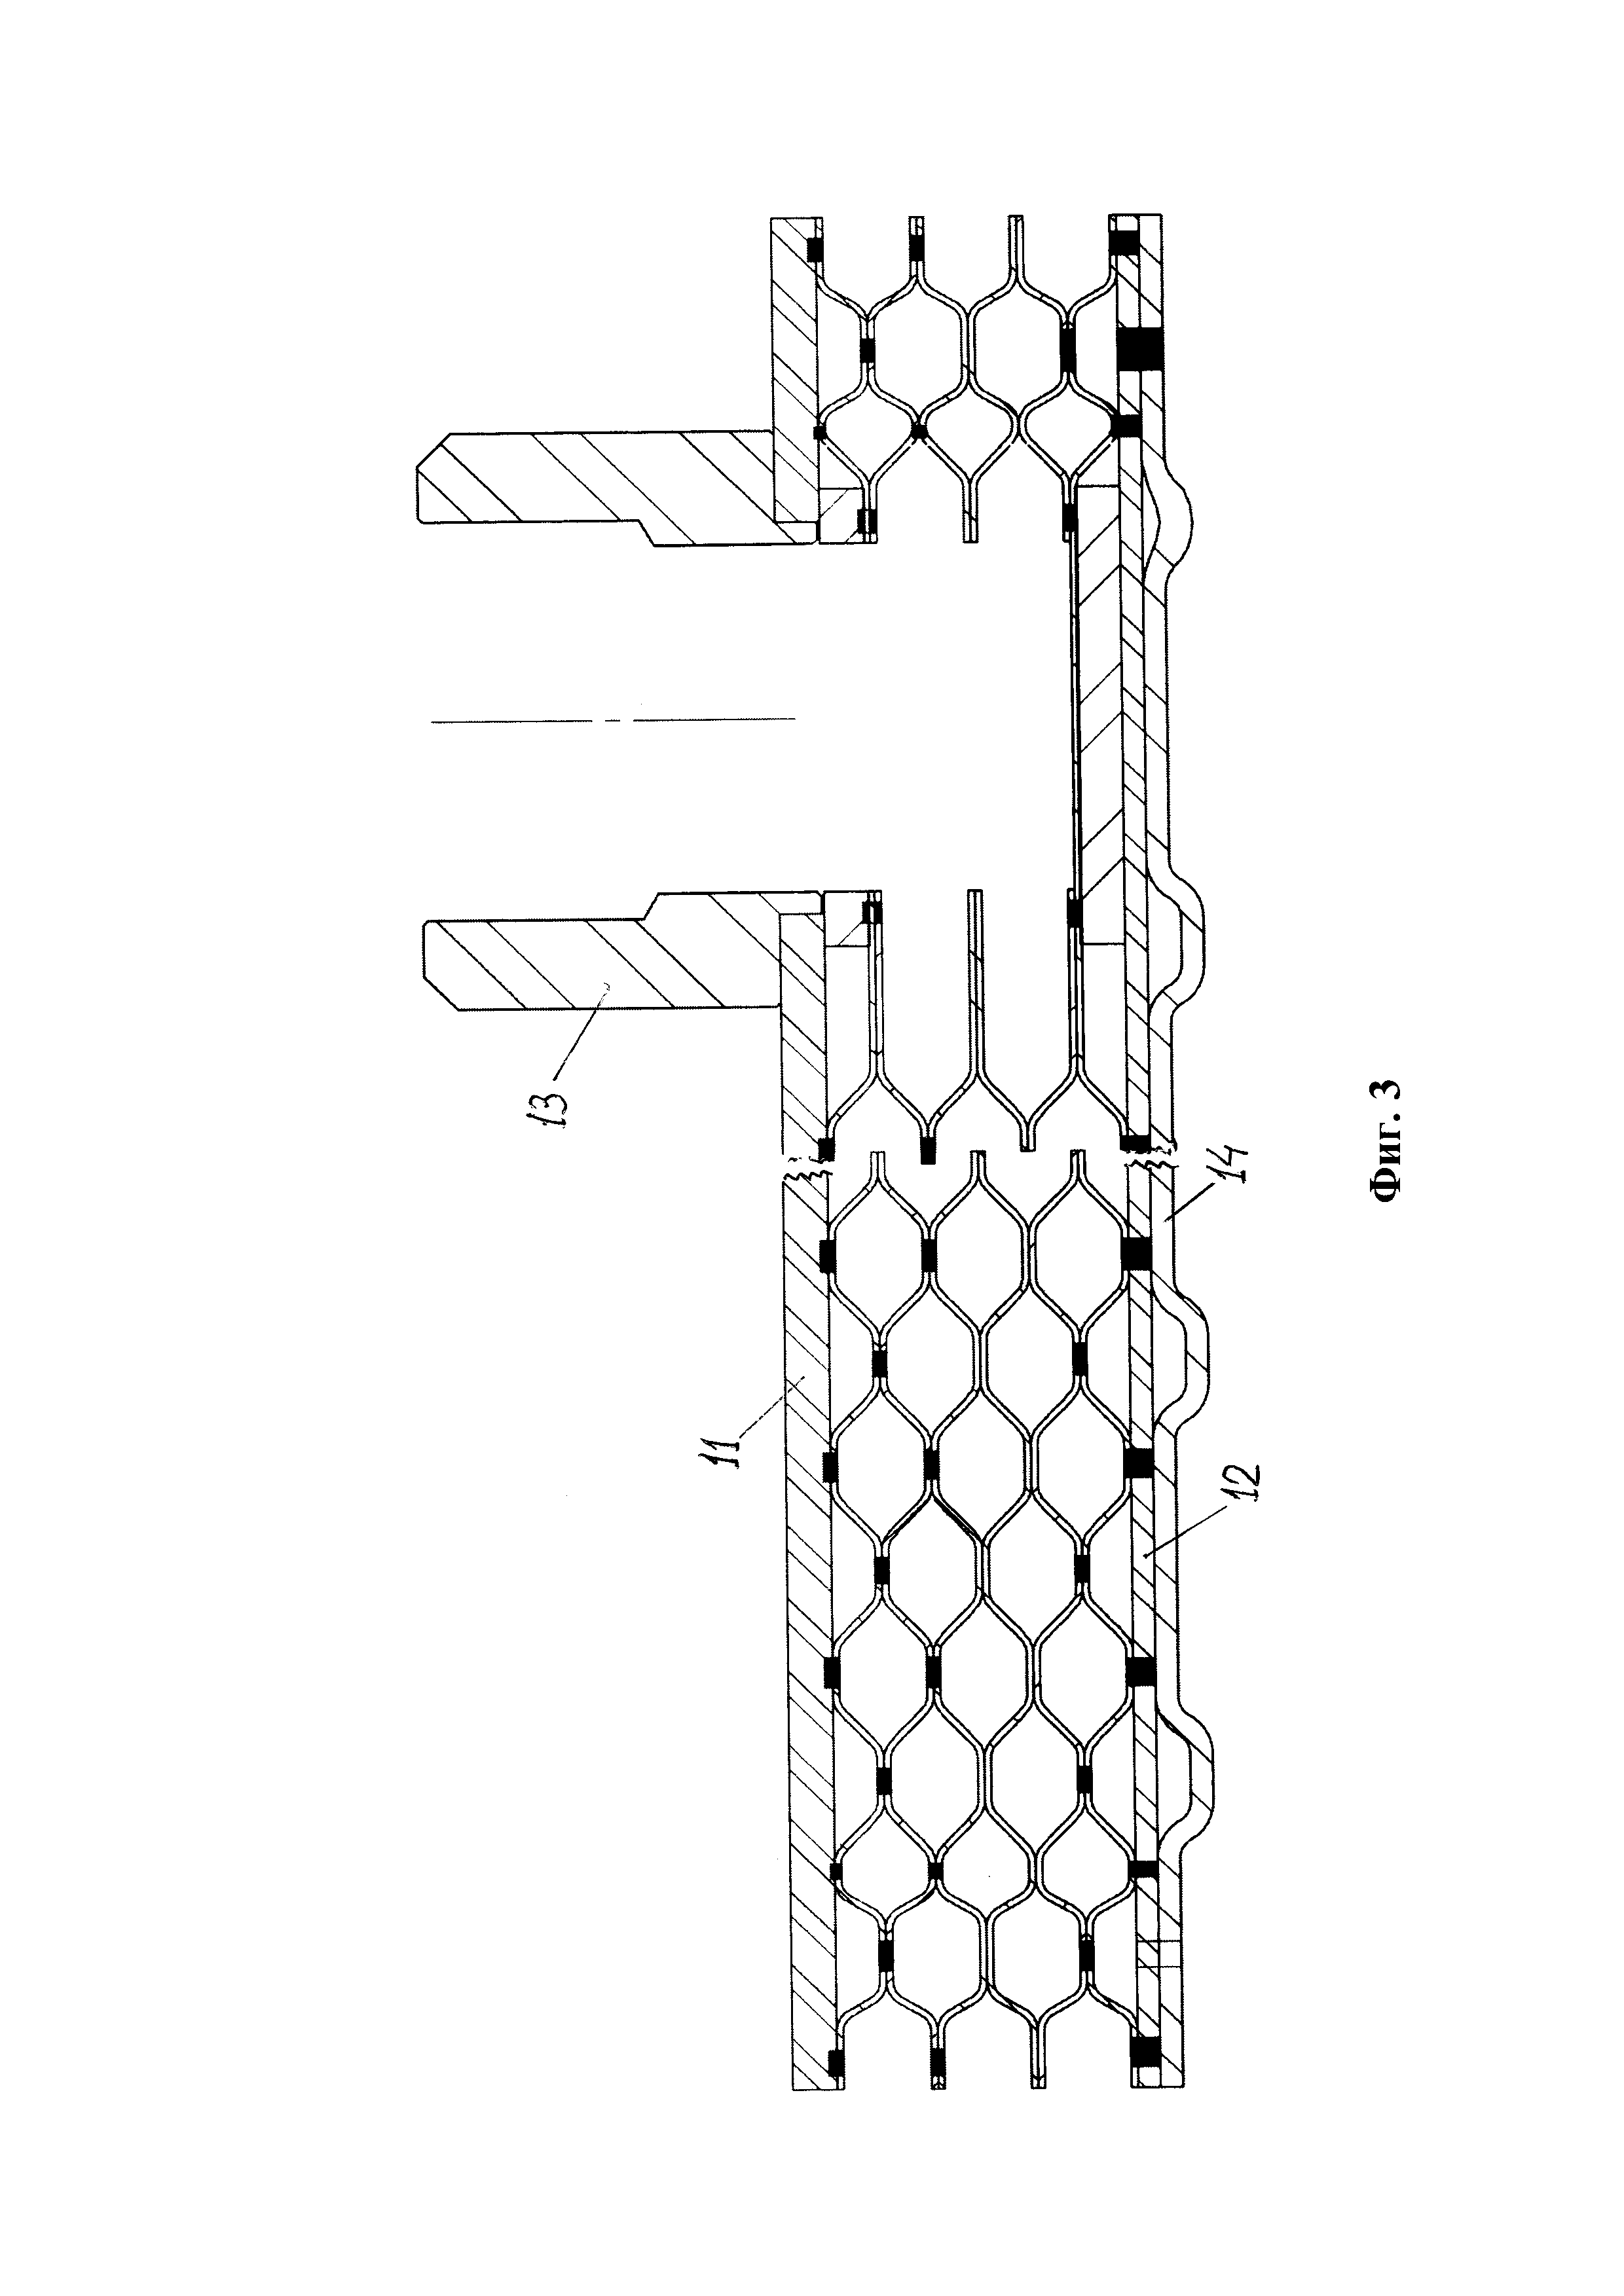 Пластина теплообменника технология изготовления Паяный теплообменник-испаритель Машимпэкс (GEA) GBS 700AE Таганрог